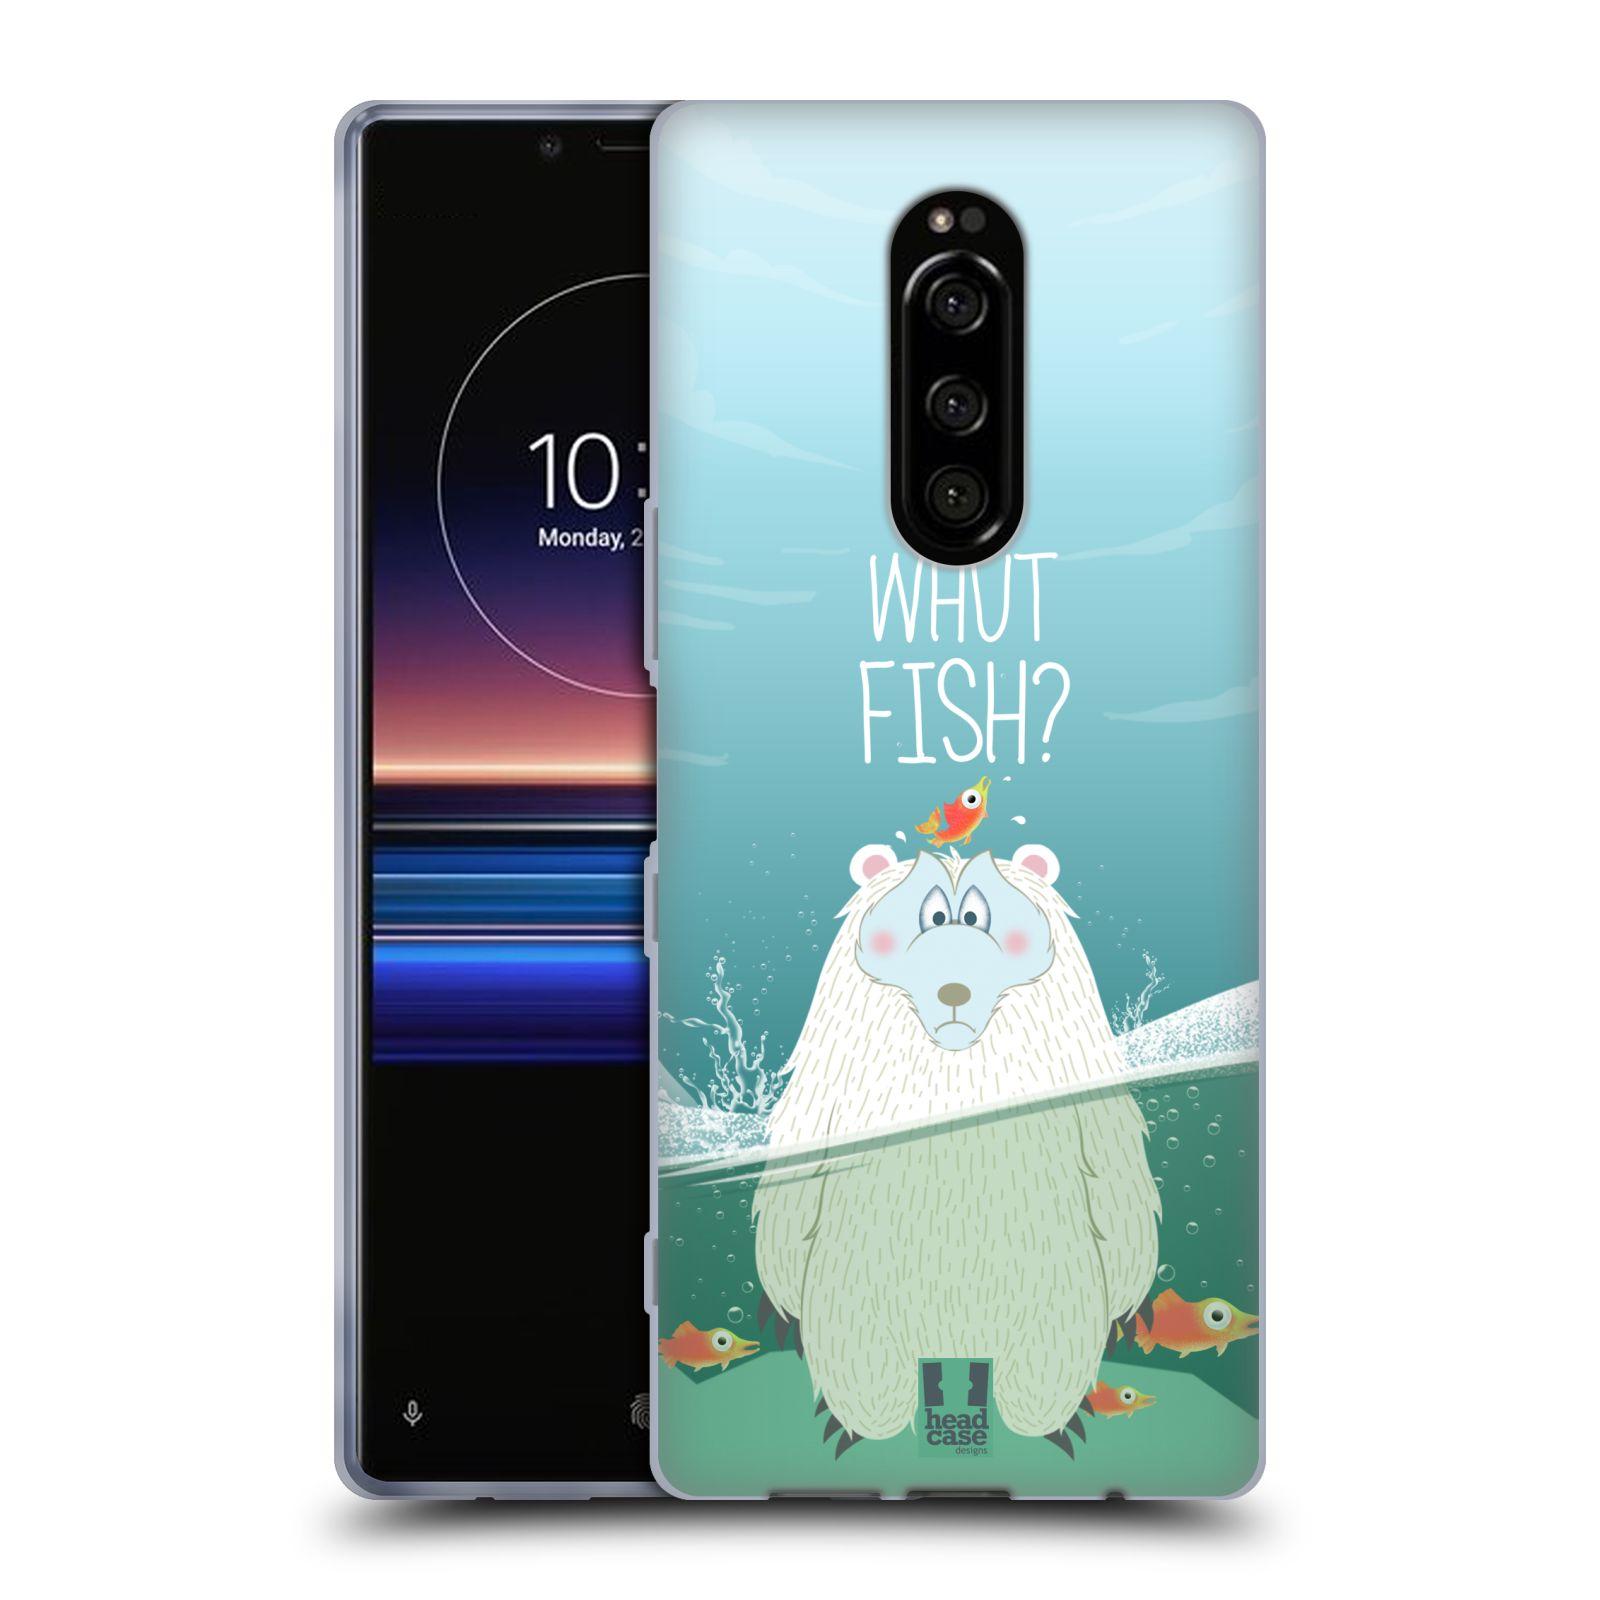 Silikonové pouzdro na mobil Sony Xperia 1 - Head Case - Medvěd Whut Fish?